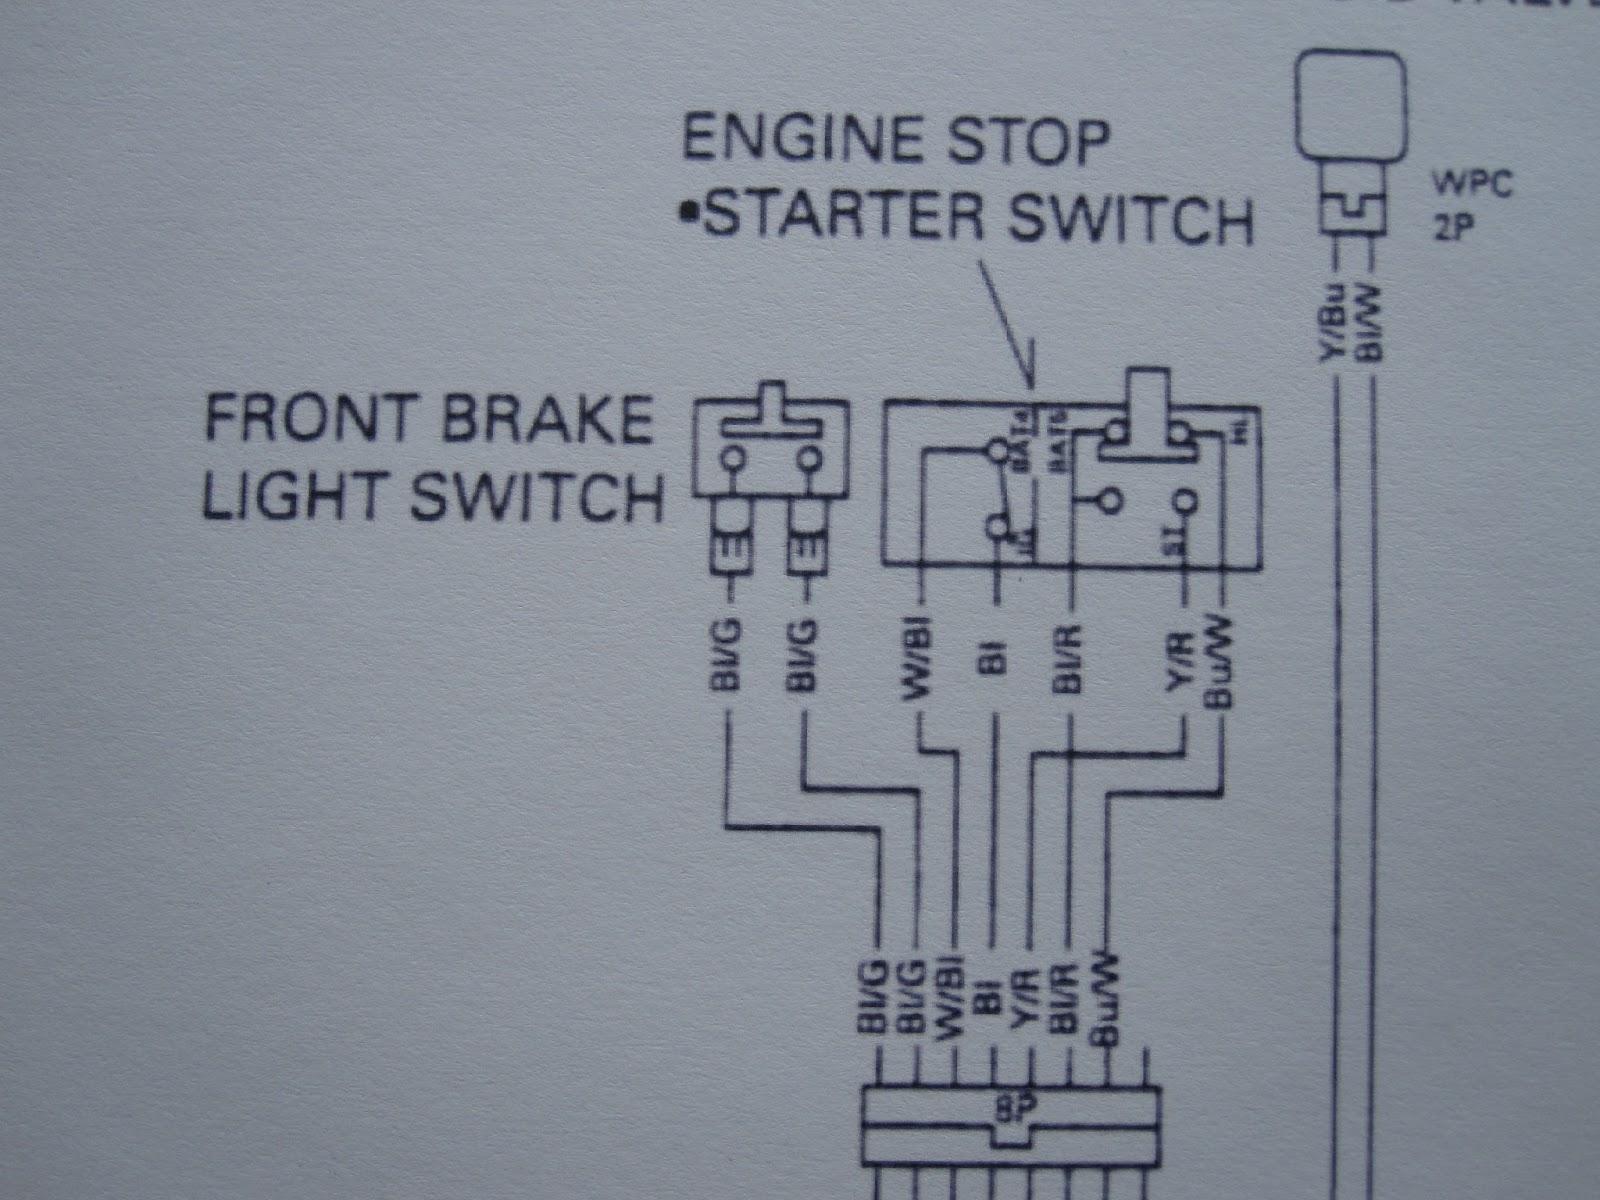 Cbr1100xx Wiring Diagram - House Wiring Diagram Symbols •